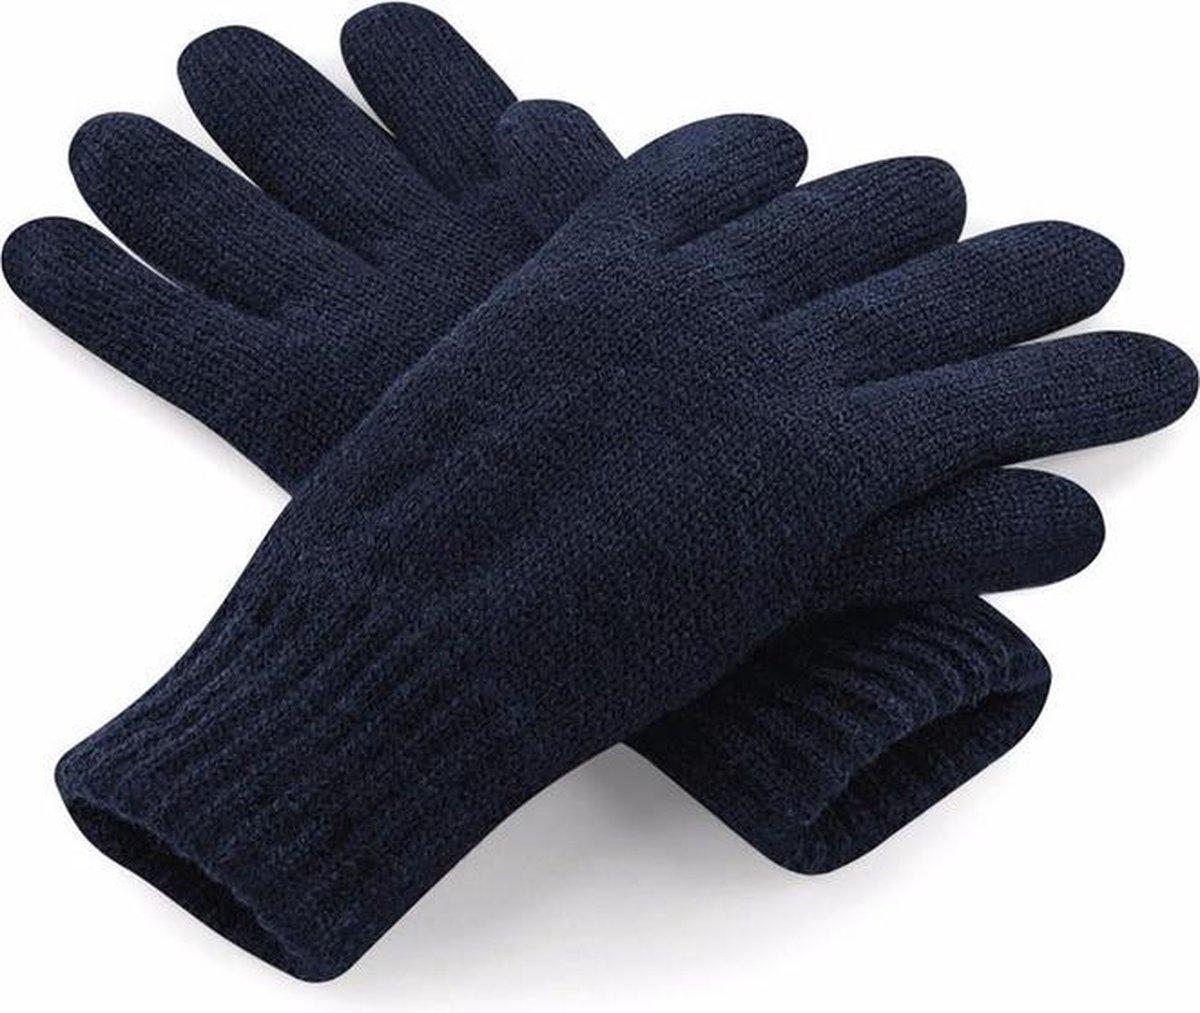 Classic thinsulate handschoenen navy S/M - Beechfield